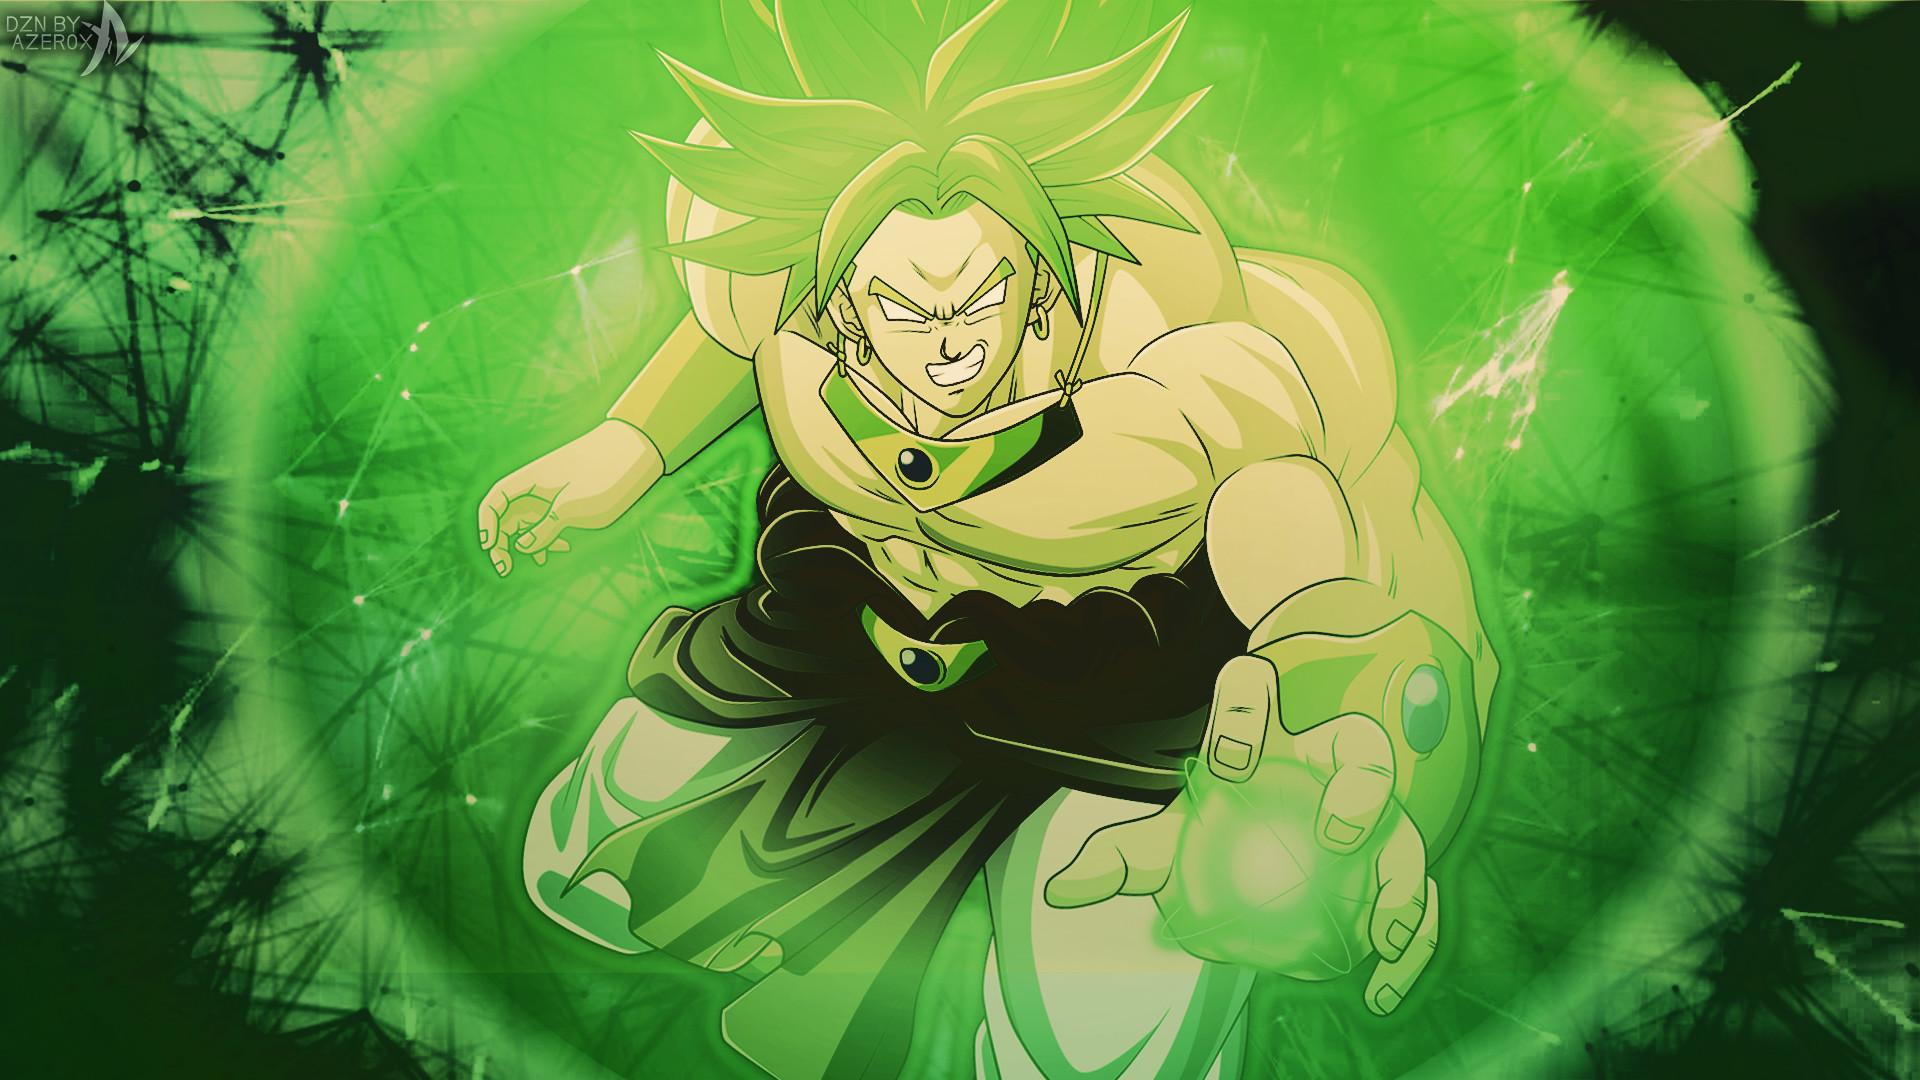 broly the legendary super saiyan full movie hd